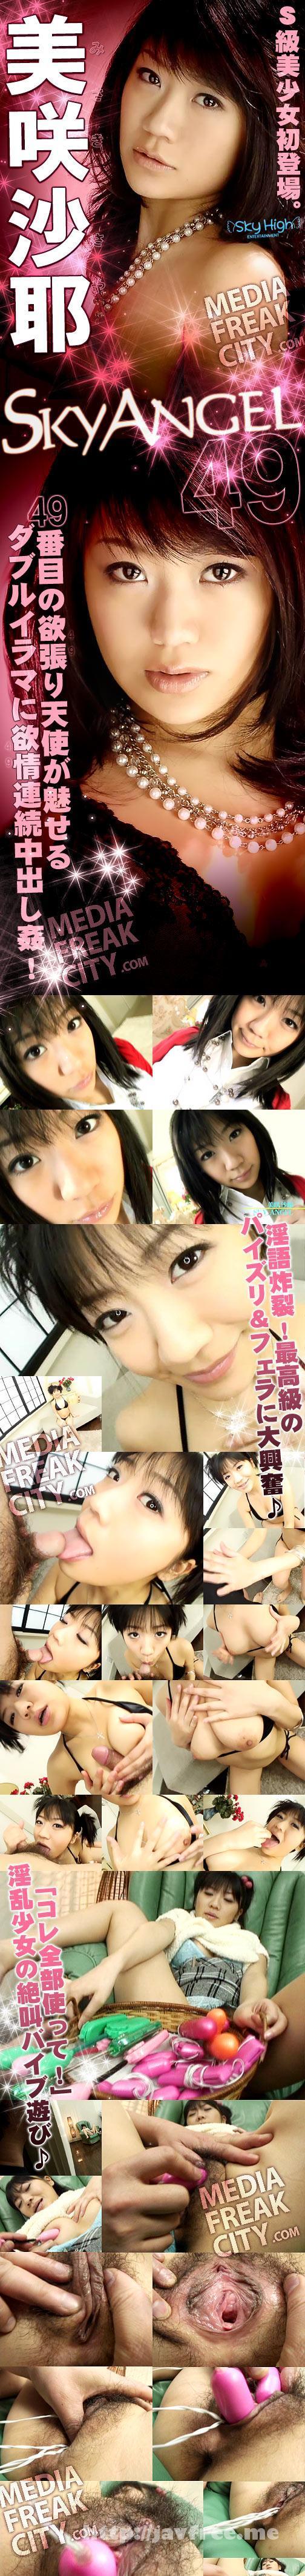 [SKY 083] スカイエンジェル Vol.49 : 美咲沙耶 美咲沙耶 SKY Misaki Saya